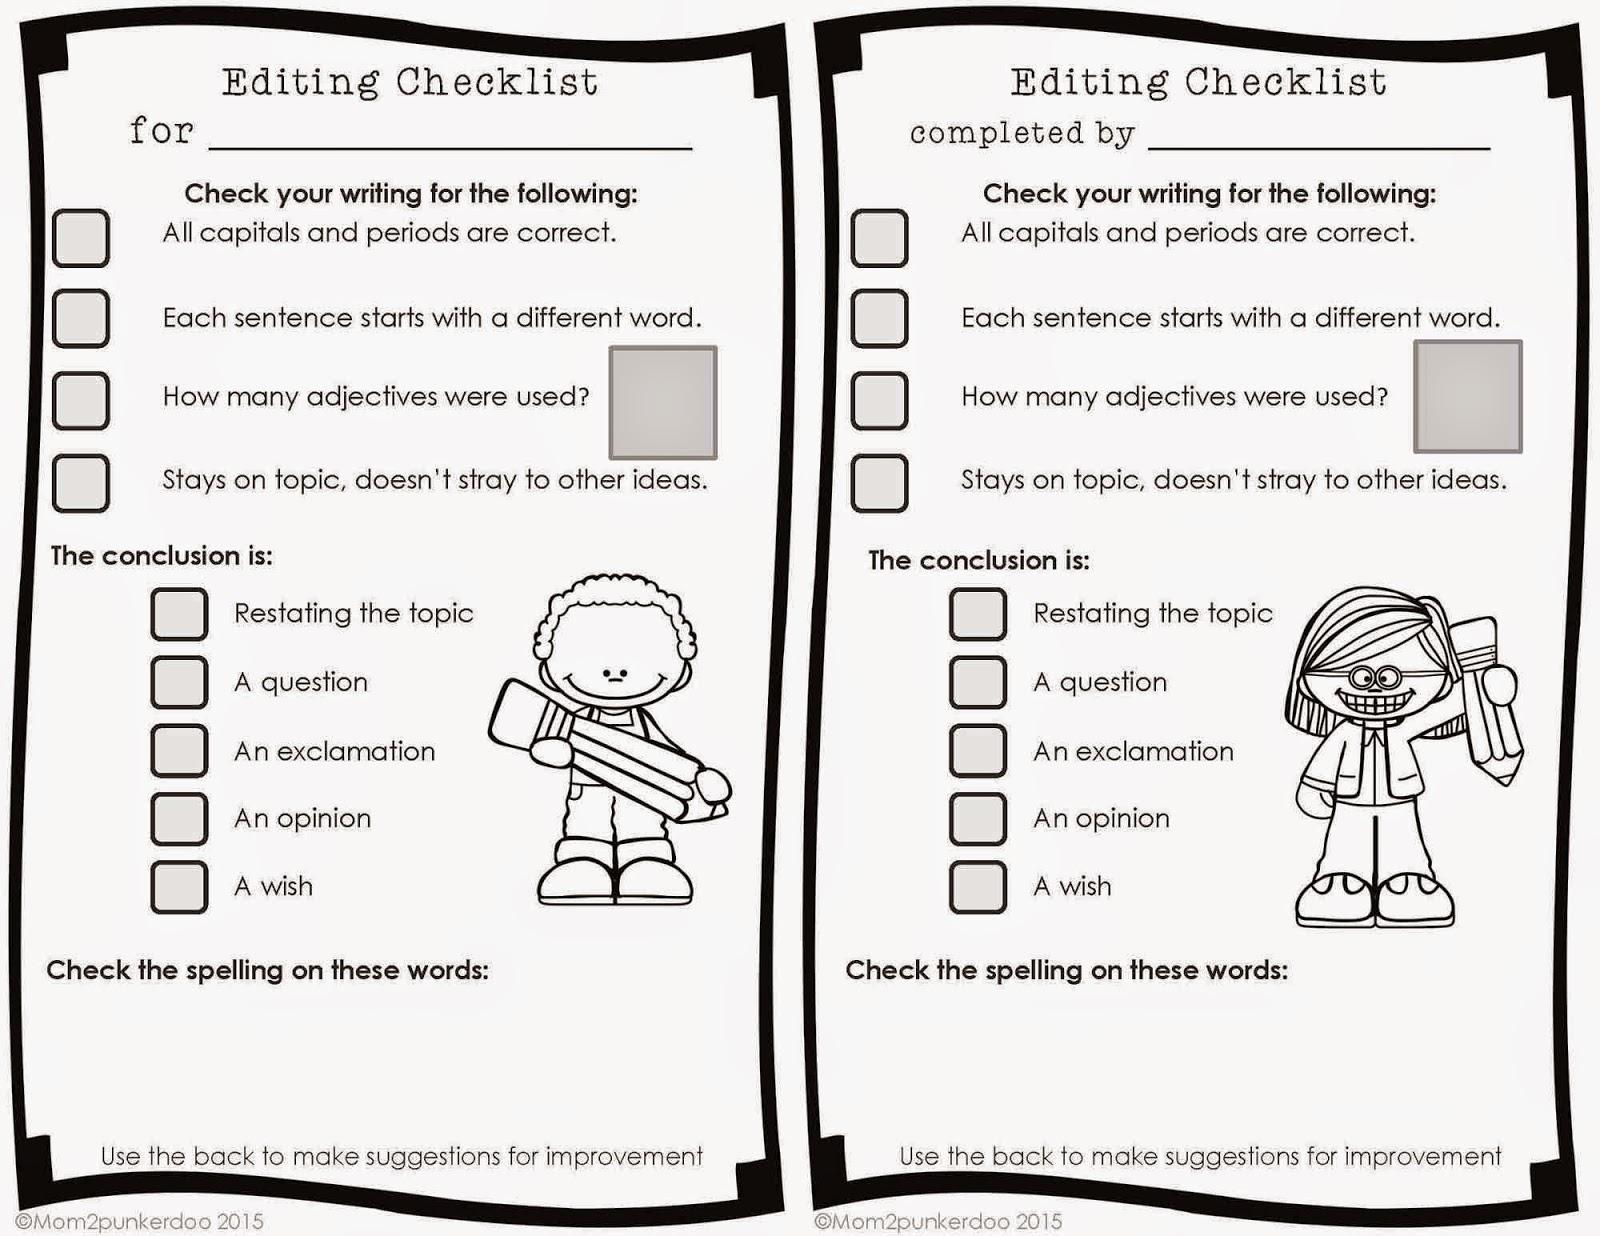 Proofreading Rksheets High School Practice Marks Rksheet Editing And | Printable Editing Worksheets